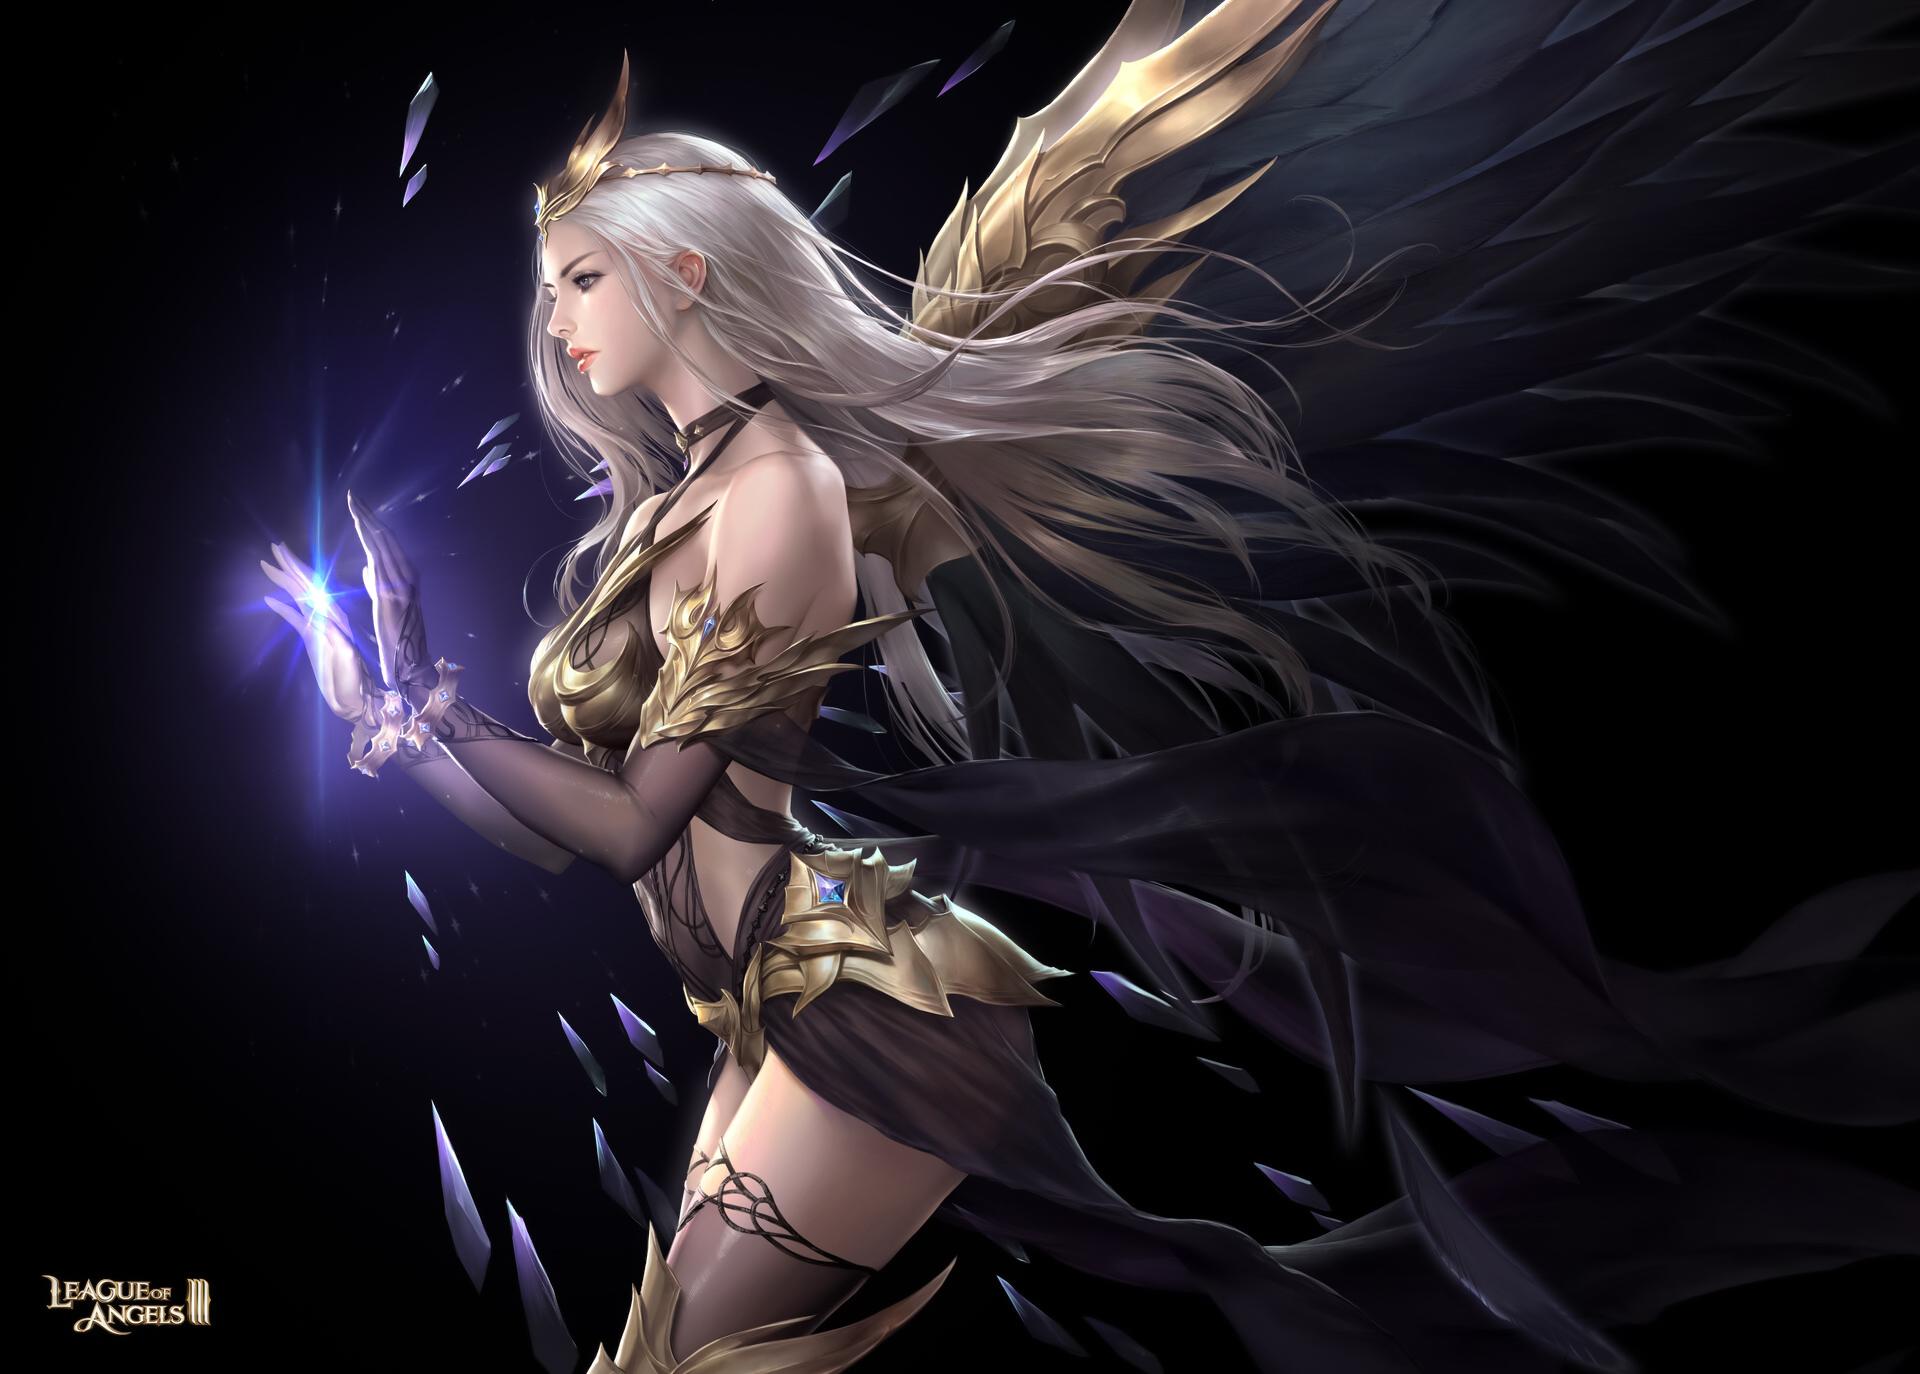 General 1920x1374 Bluezima drawing women blonde long hair tiaras looking away magician spell dress profile wings dark League of Angels people